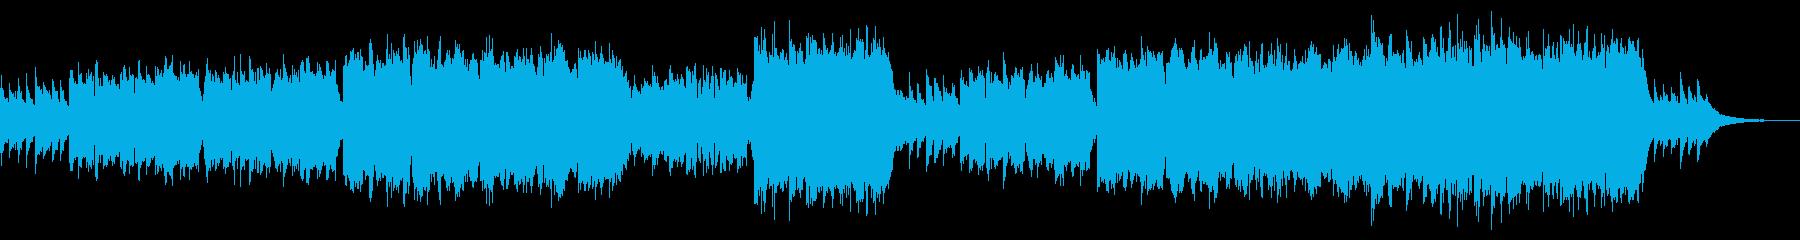 CMや映像に 透明感あるピアノとフルートの再生済みの波形